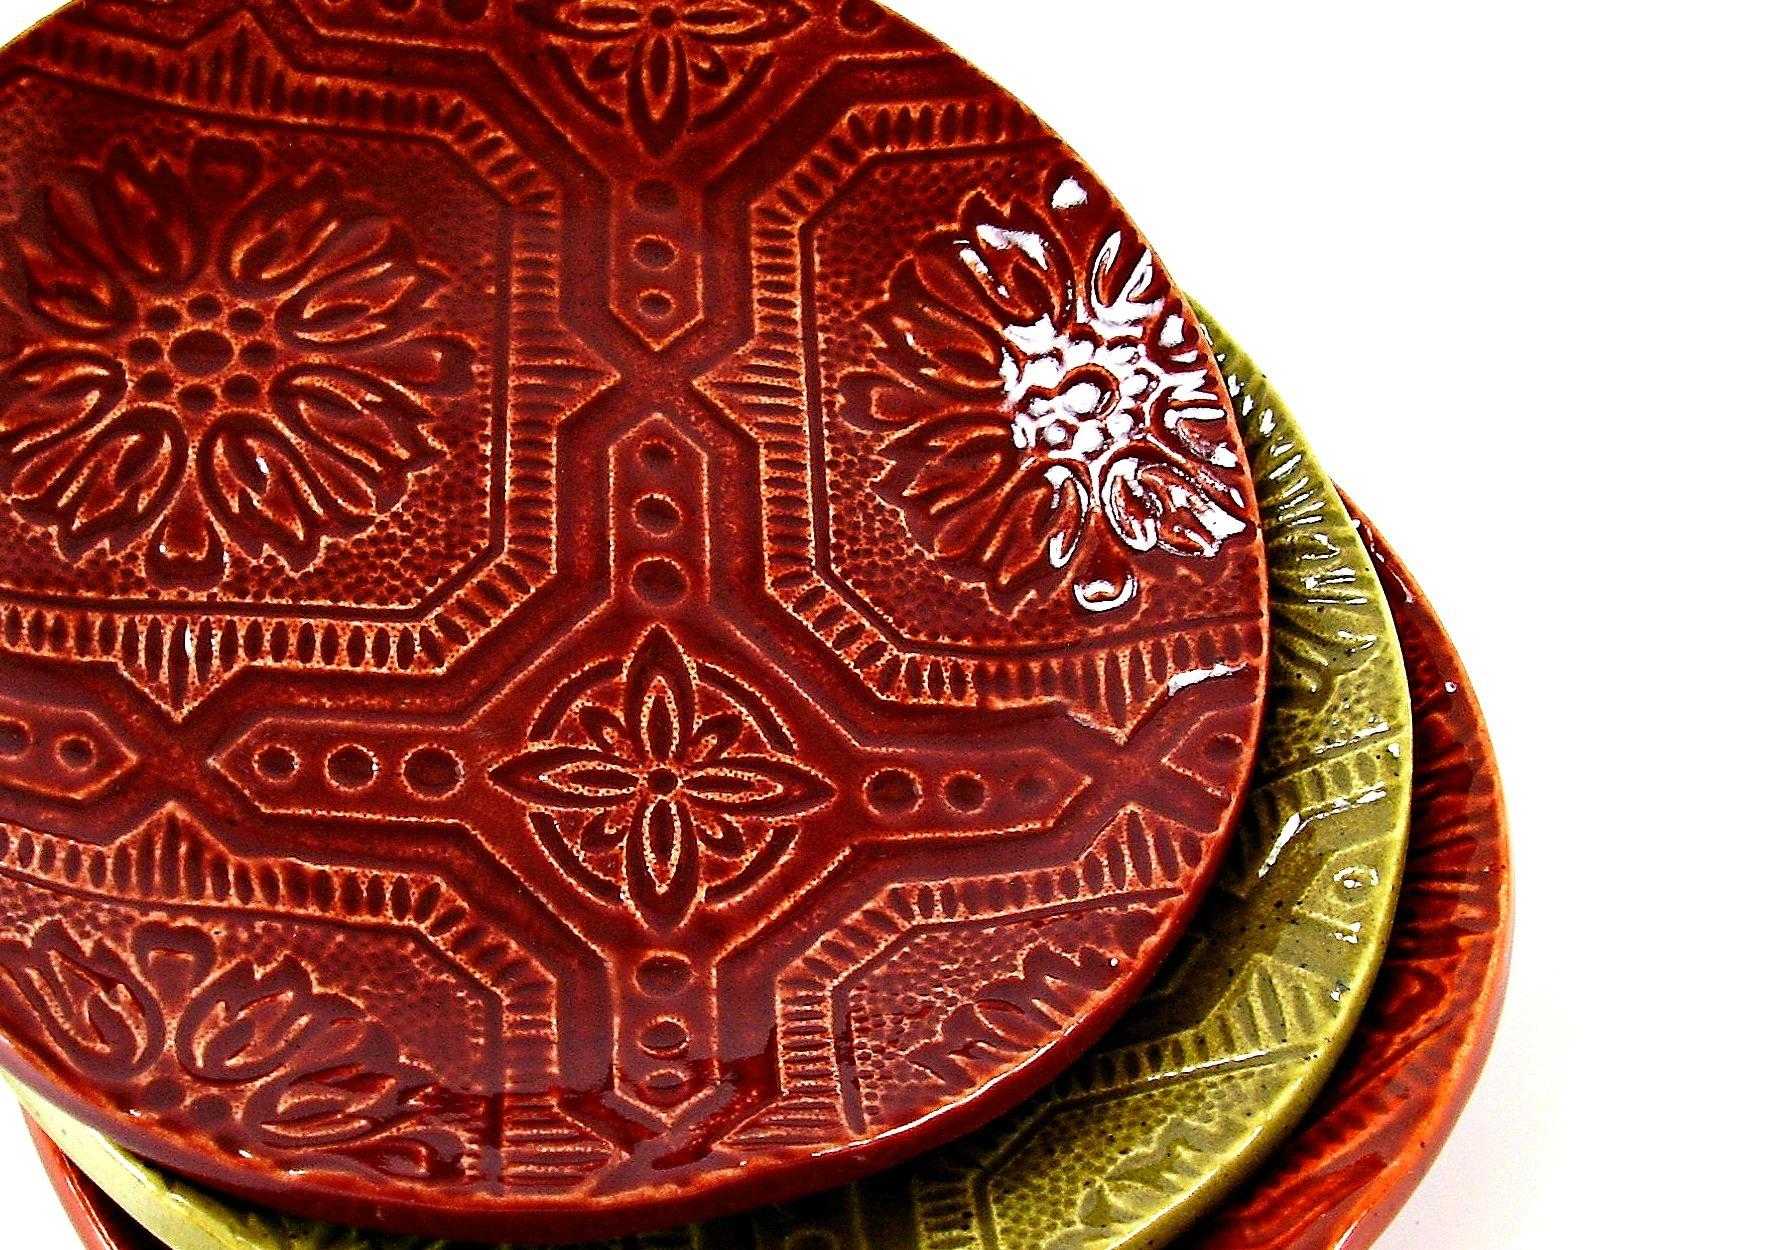 OLYMPUS DIGITAL CAMERA  sc 1 st  Raven Hill Pottery & Vintage Cottage | Raven Hill Pottery